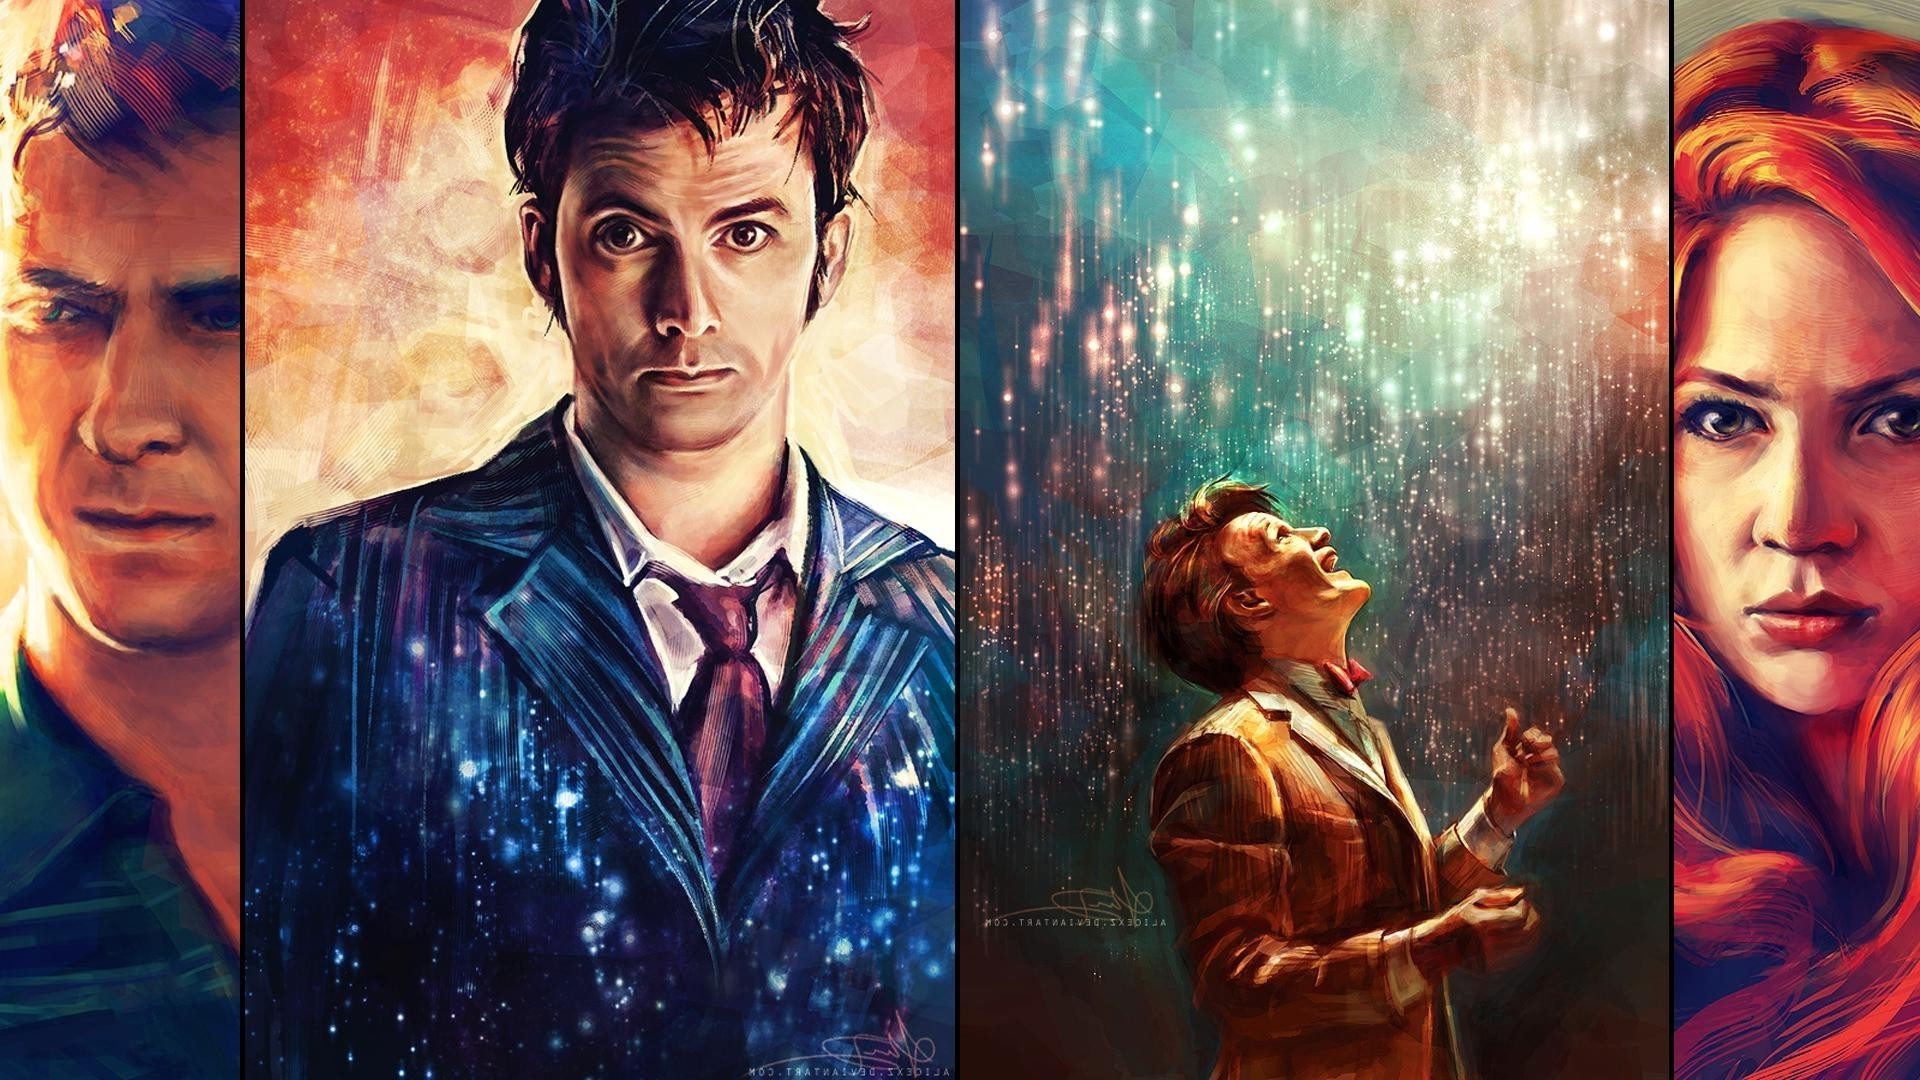 Doctor Who, The Doctor, Artwork, Painting, David Tennant, Matt Smith, Karen  Gillan, Amy Pond, Rory Williams, Arthur Darvill, Alicexz, Tenth Doctor, …